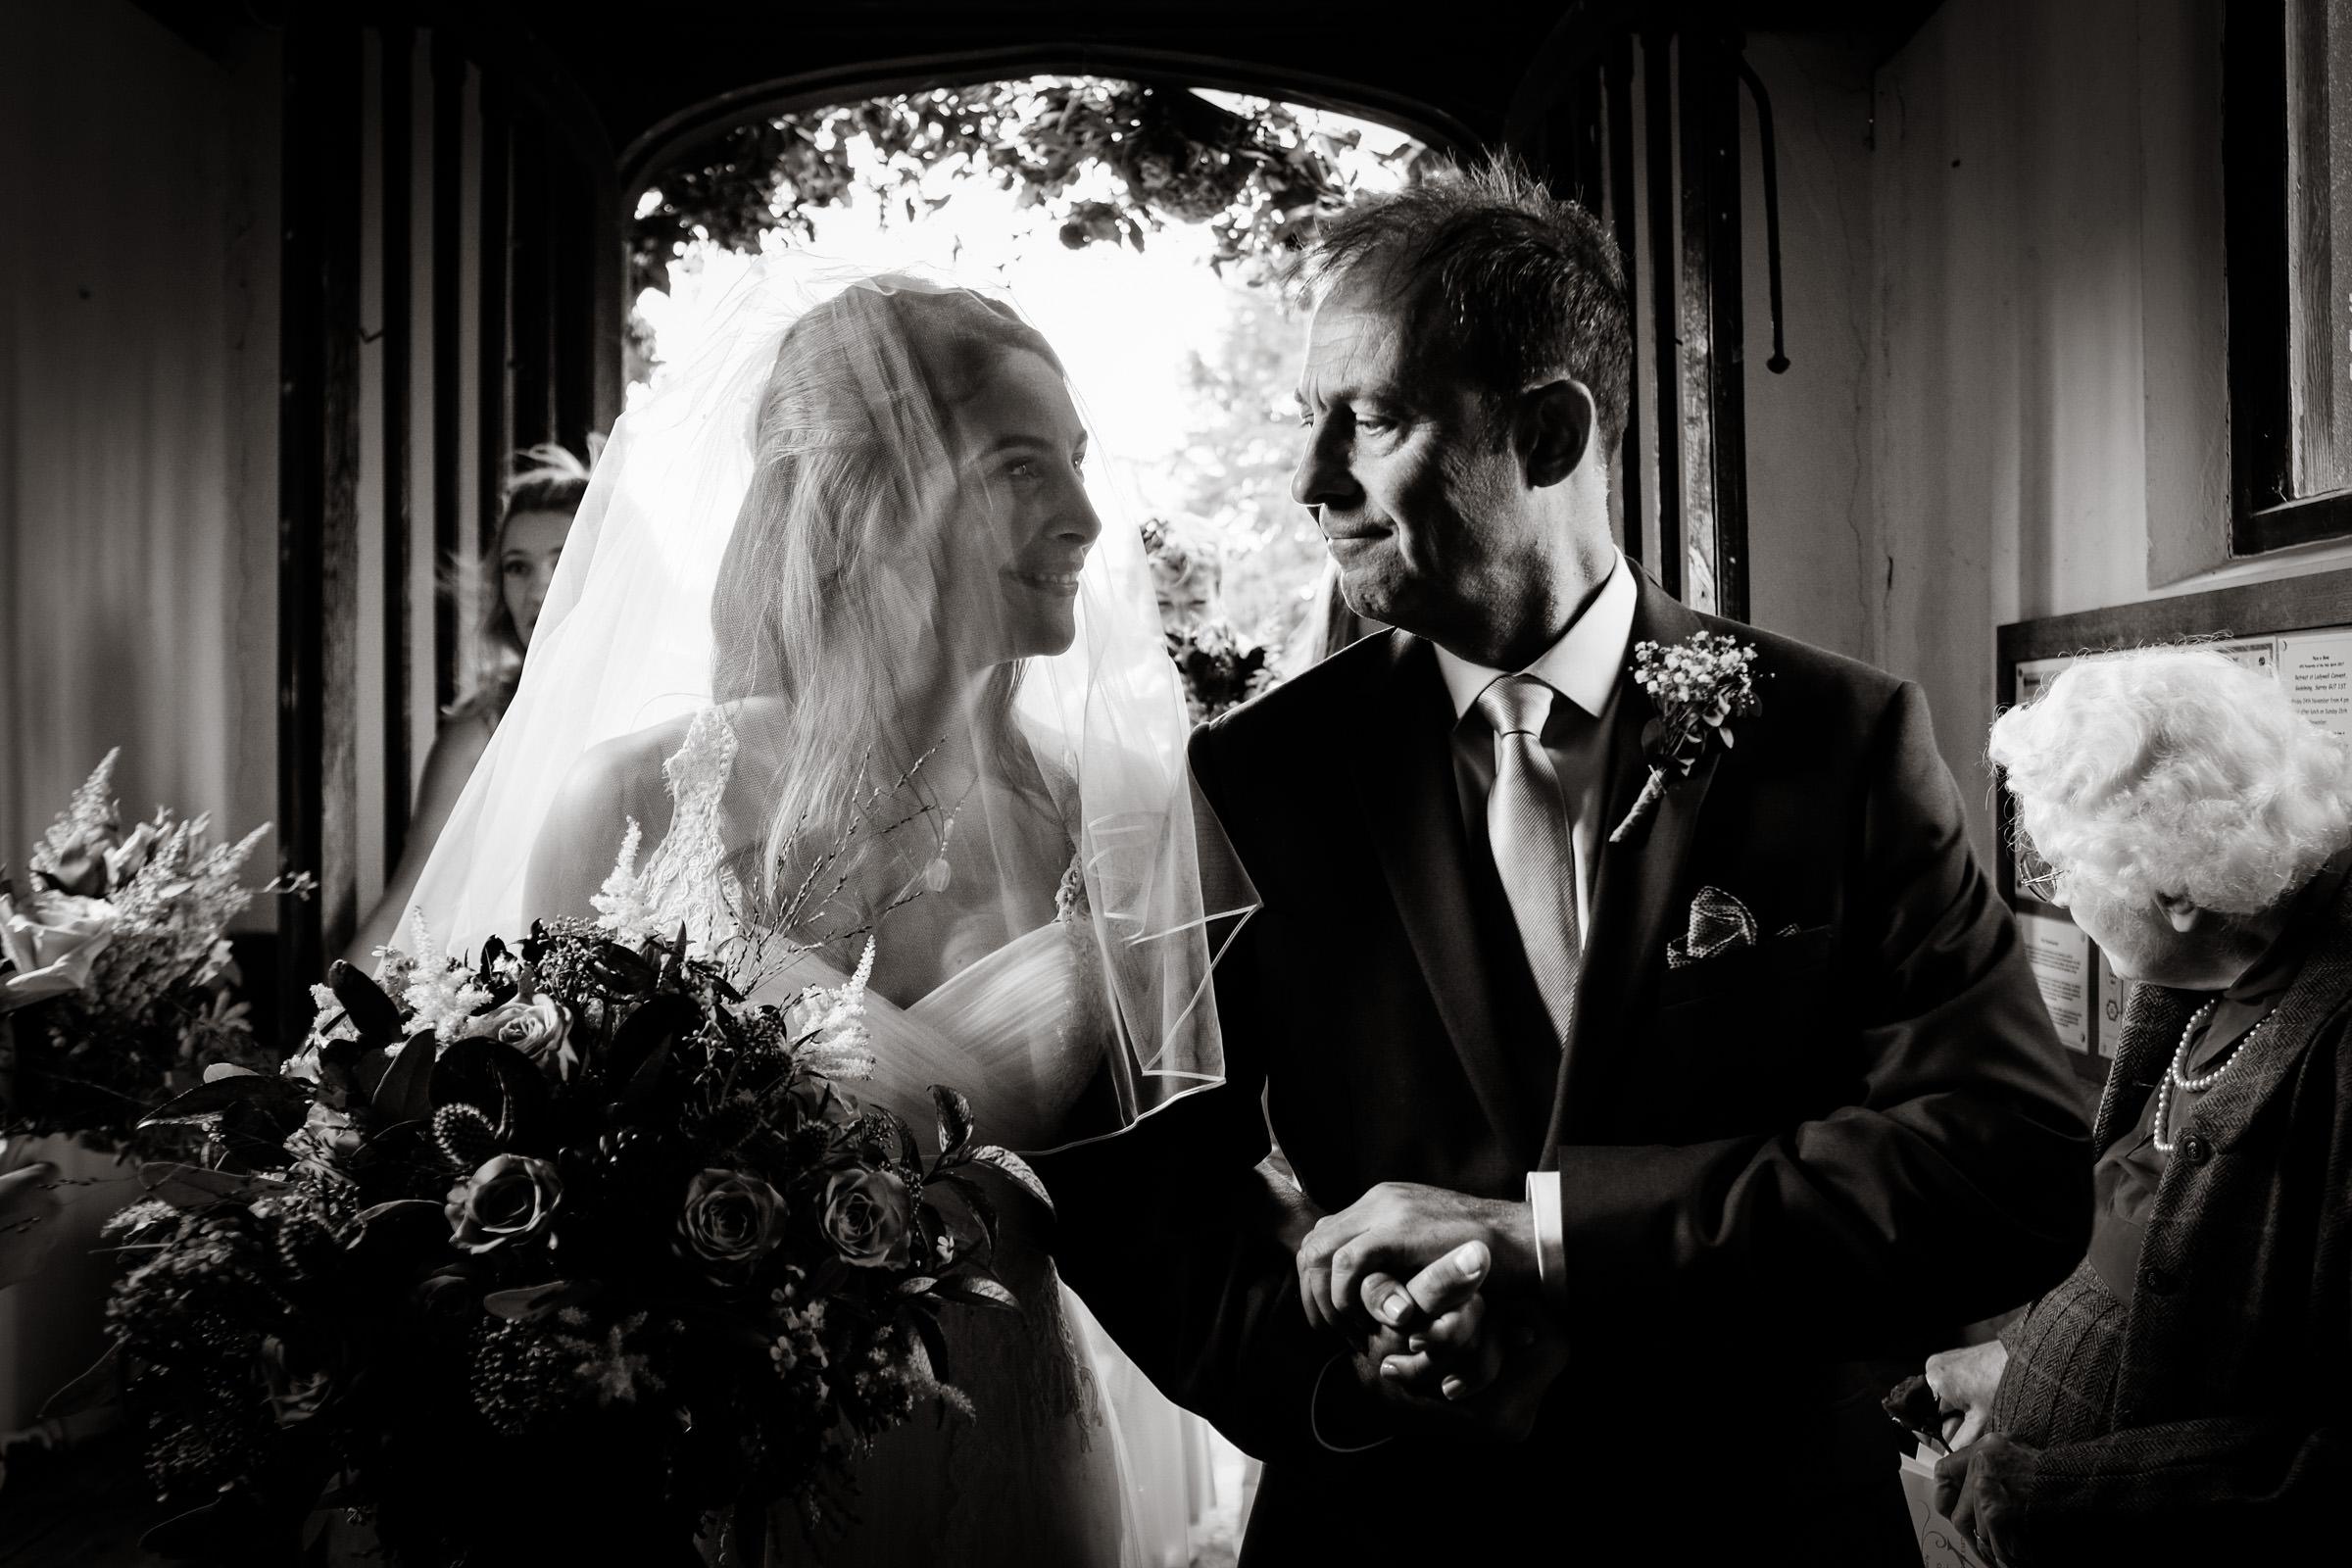 Natural+wedding+photography+portfolio+105.jpg